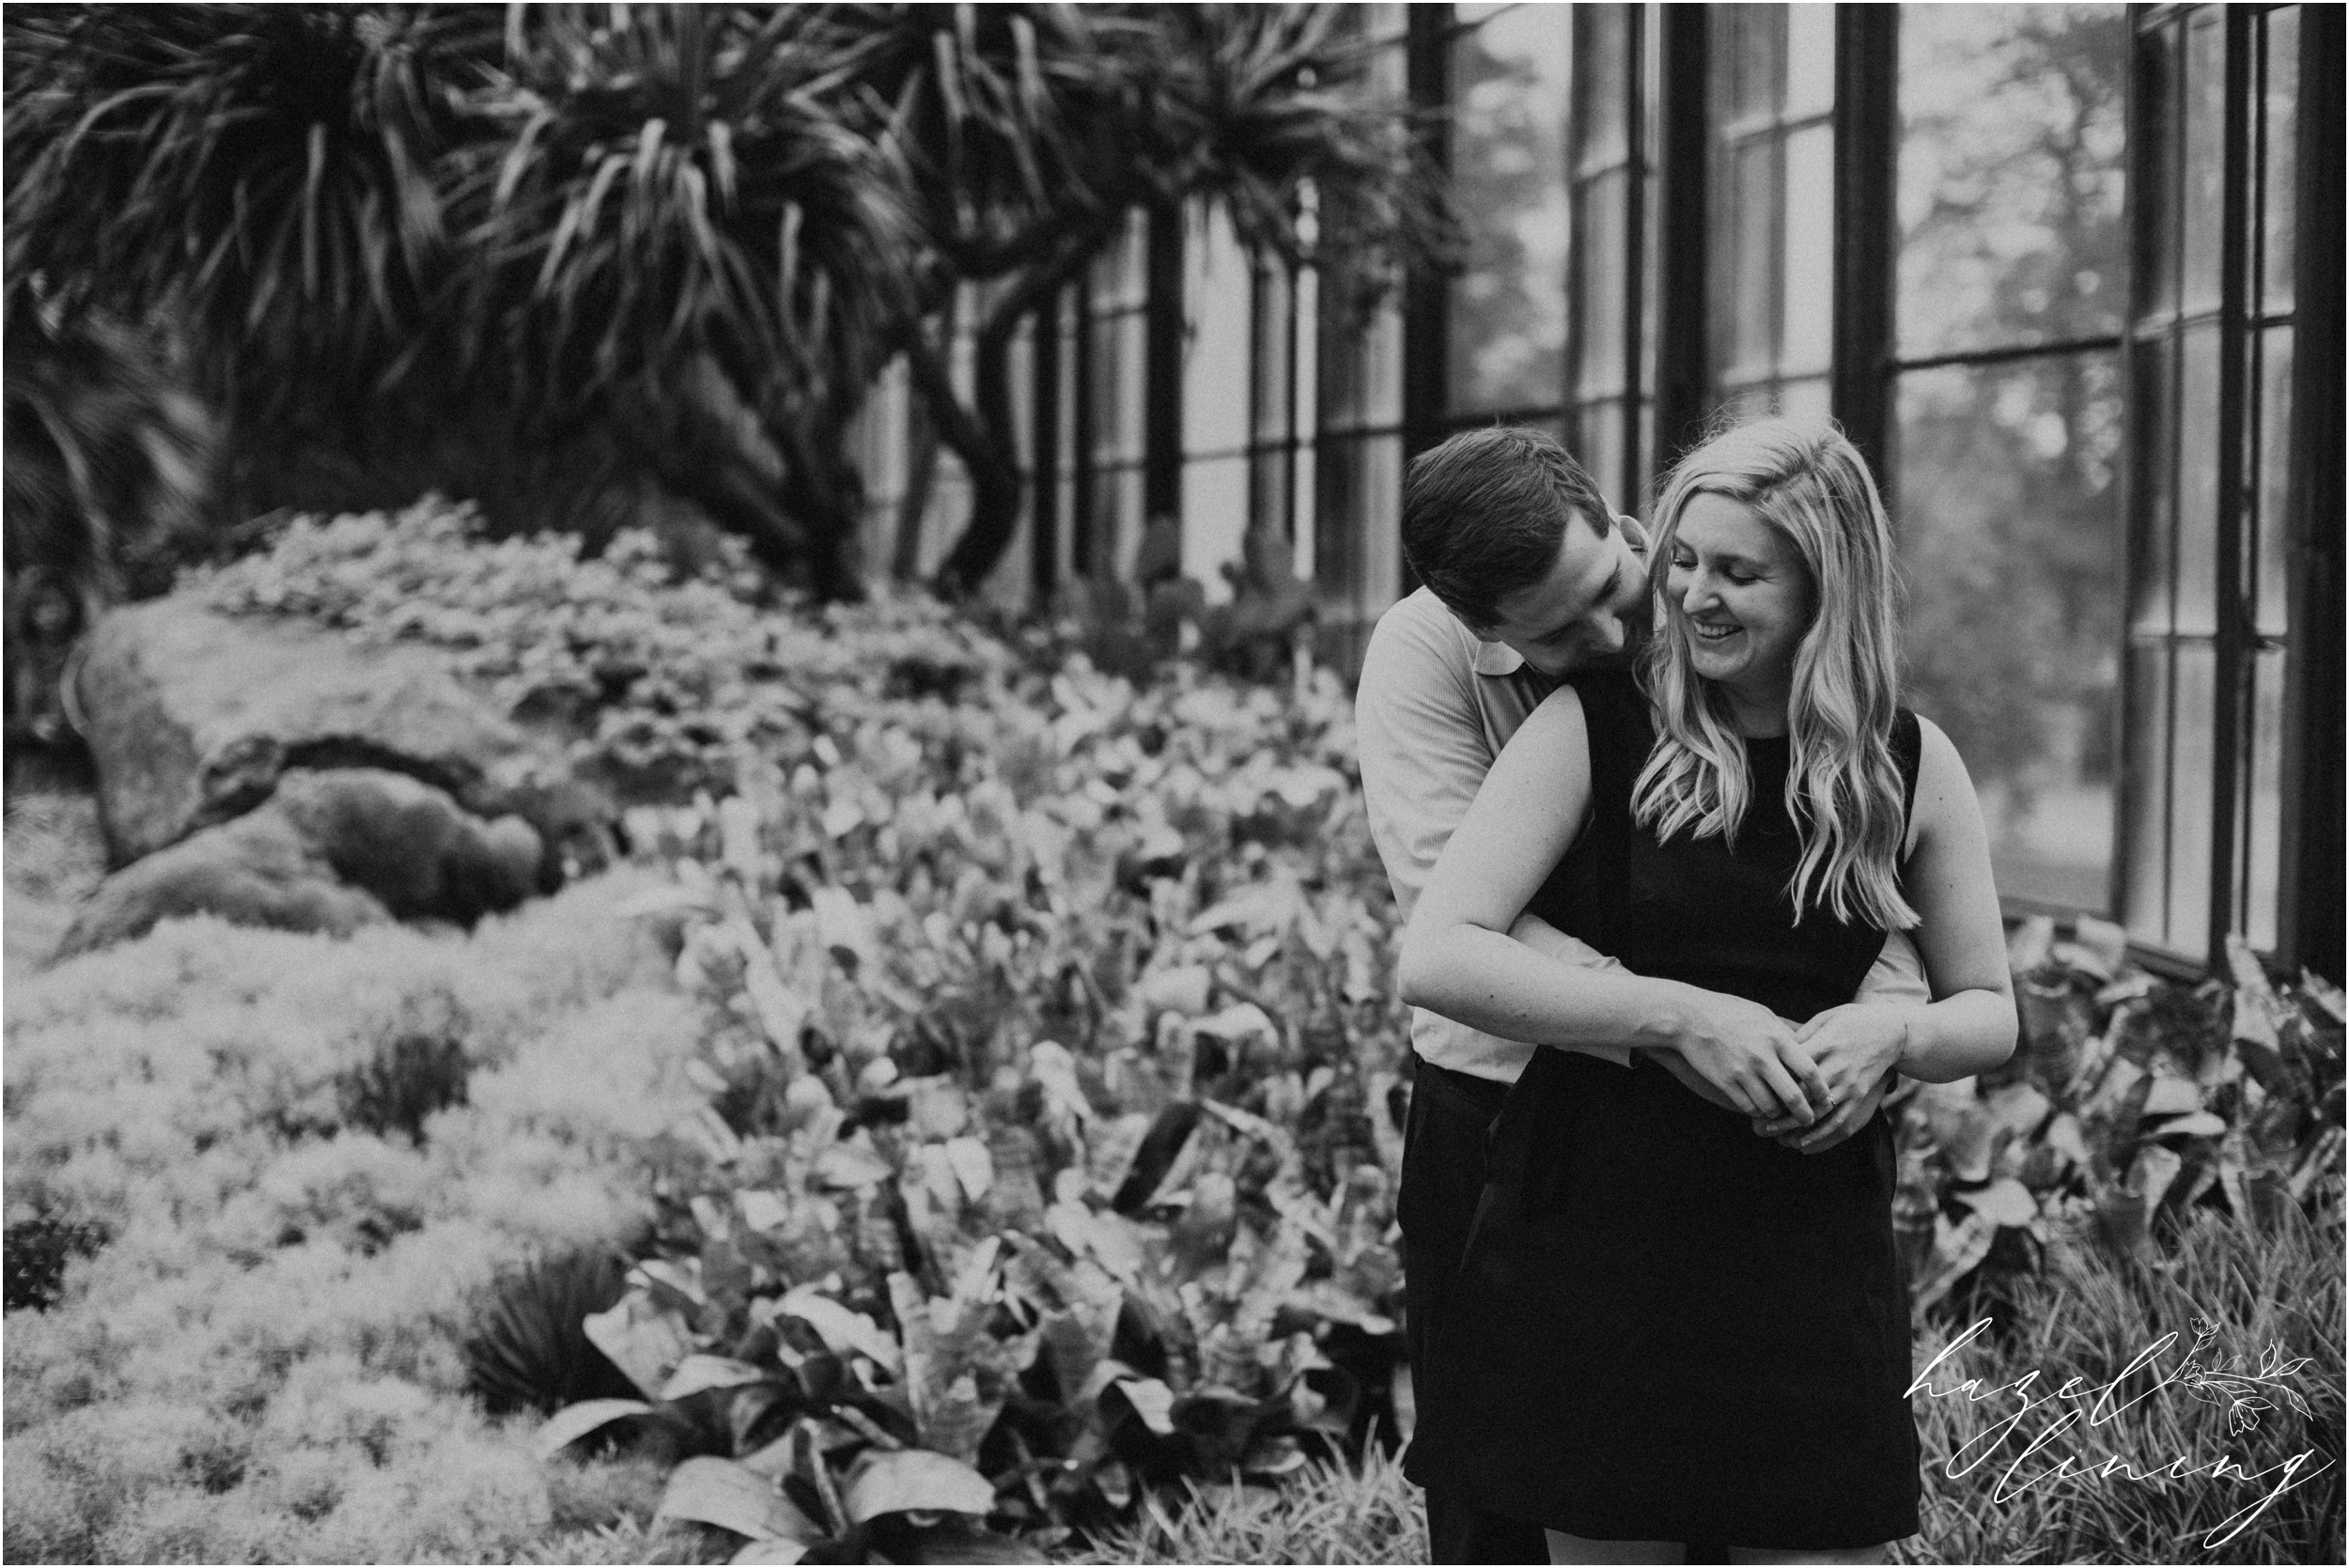 victoria-travis-logan-mayes-longwood-gardens-kennett-square-philadelphia-engagement-session-hazel-lining-photography-destination-elopement-wedding-engagement-photography_0051.jpg